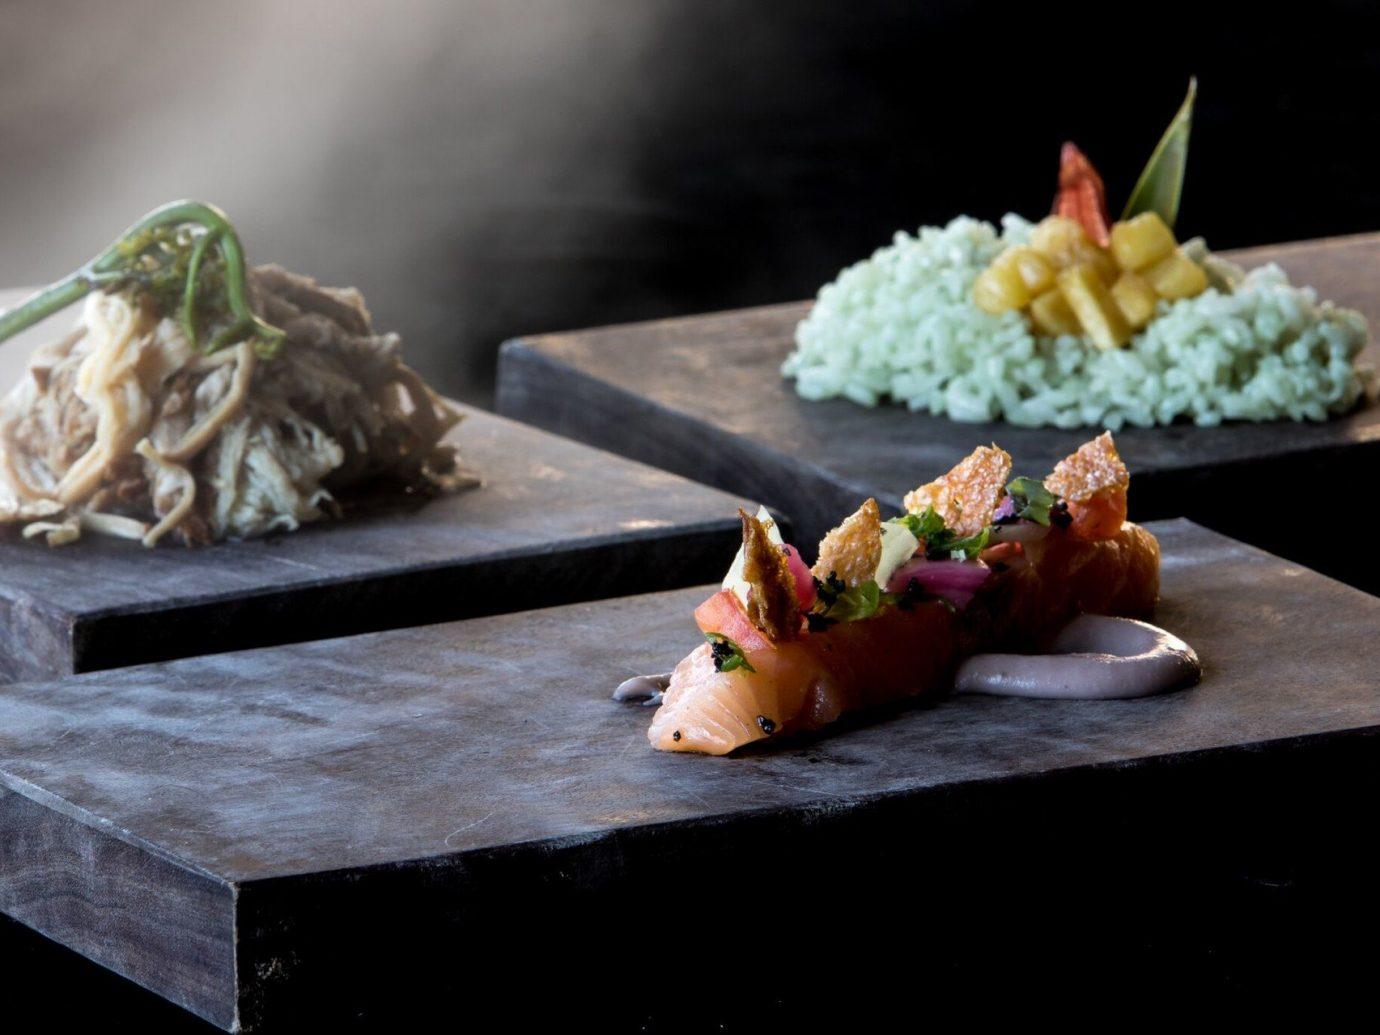 Jetsetter Guides table food dish cuisine meal restaurant asian food produce sushi sense